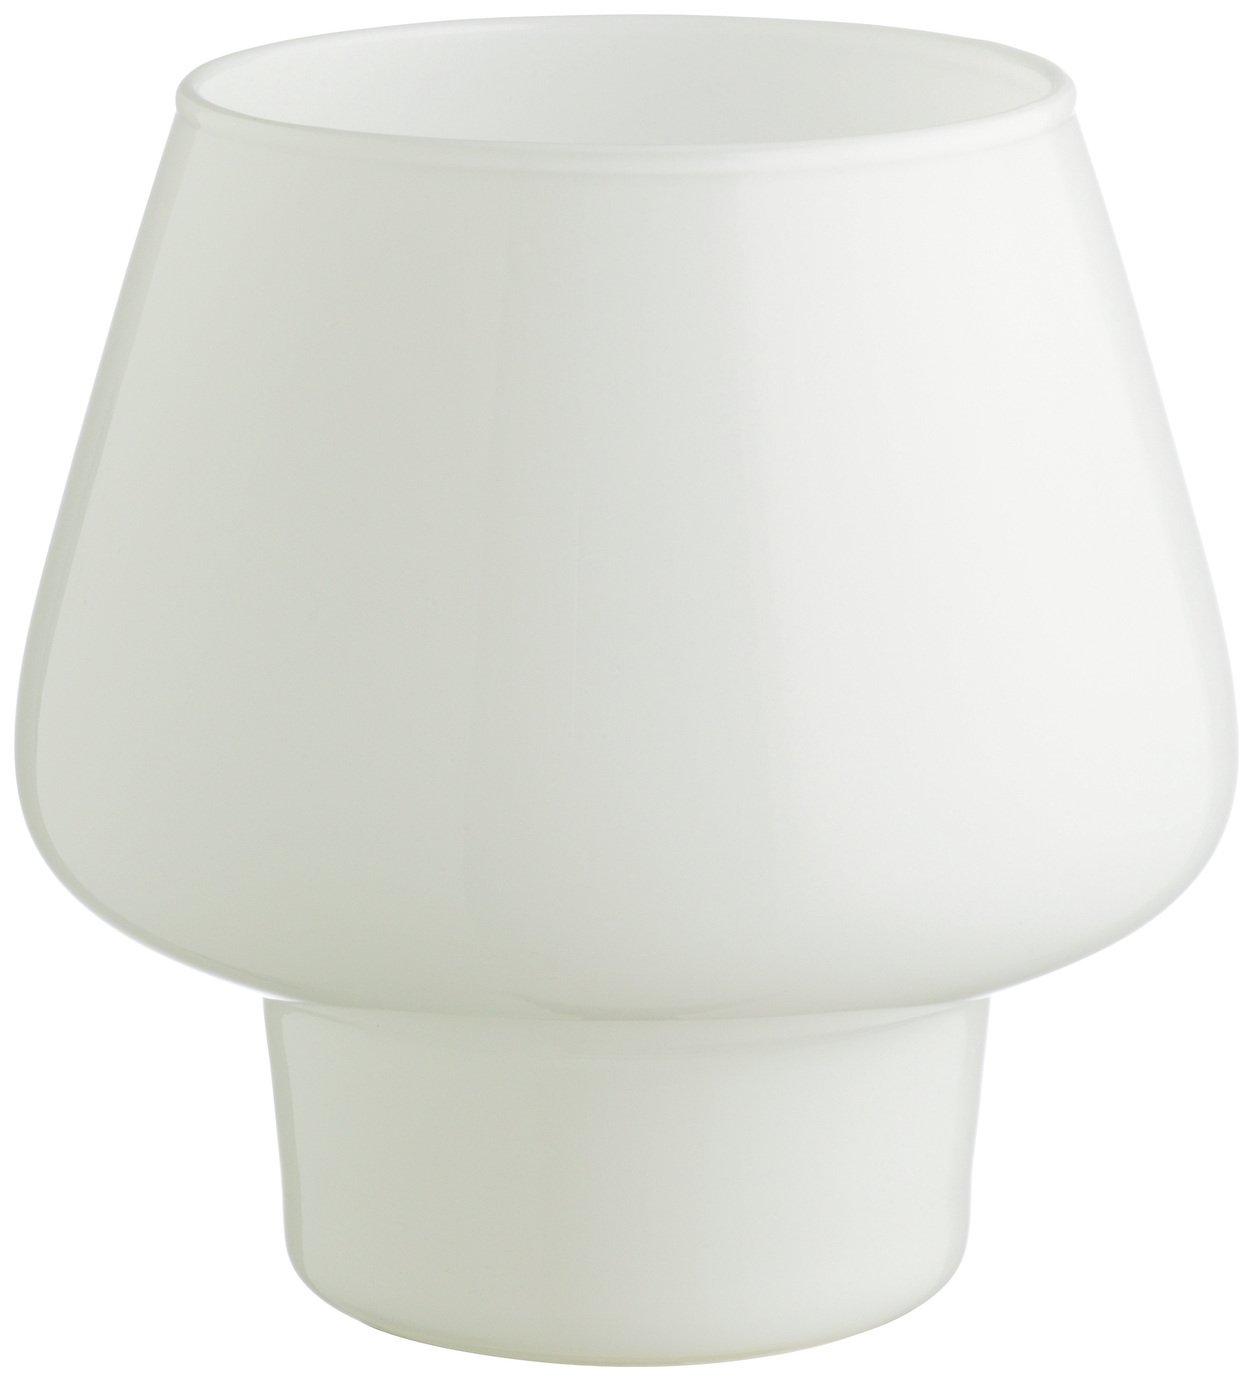 Habitat Lyss White Glass Table Lamp - White